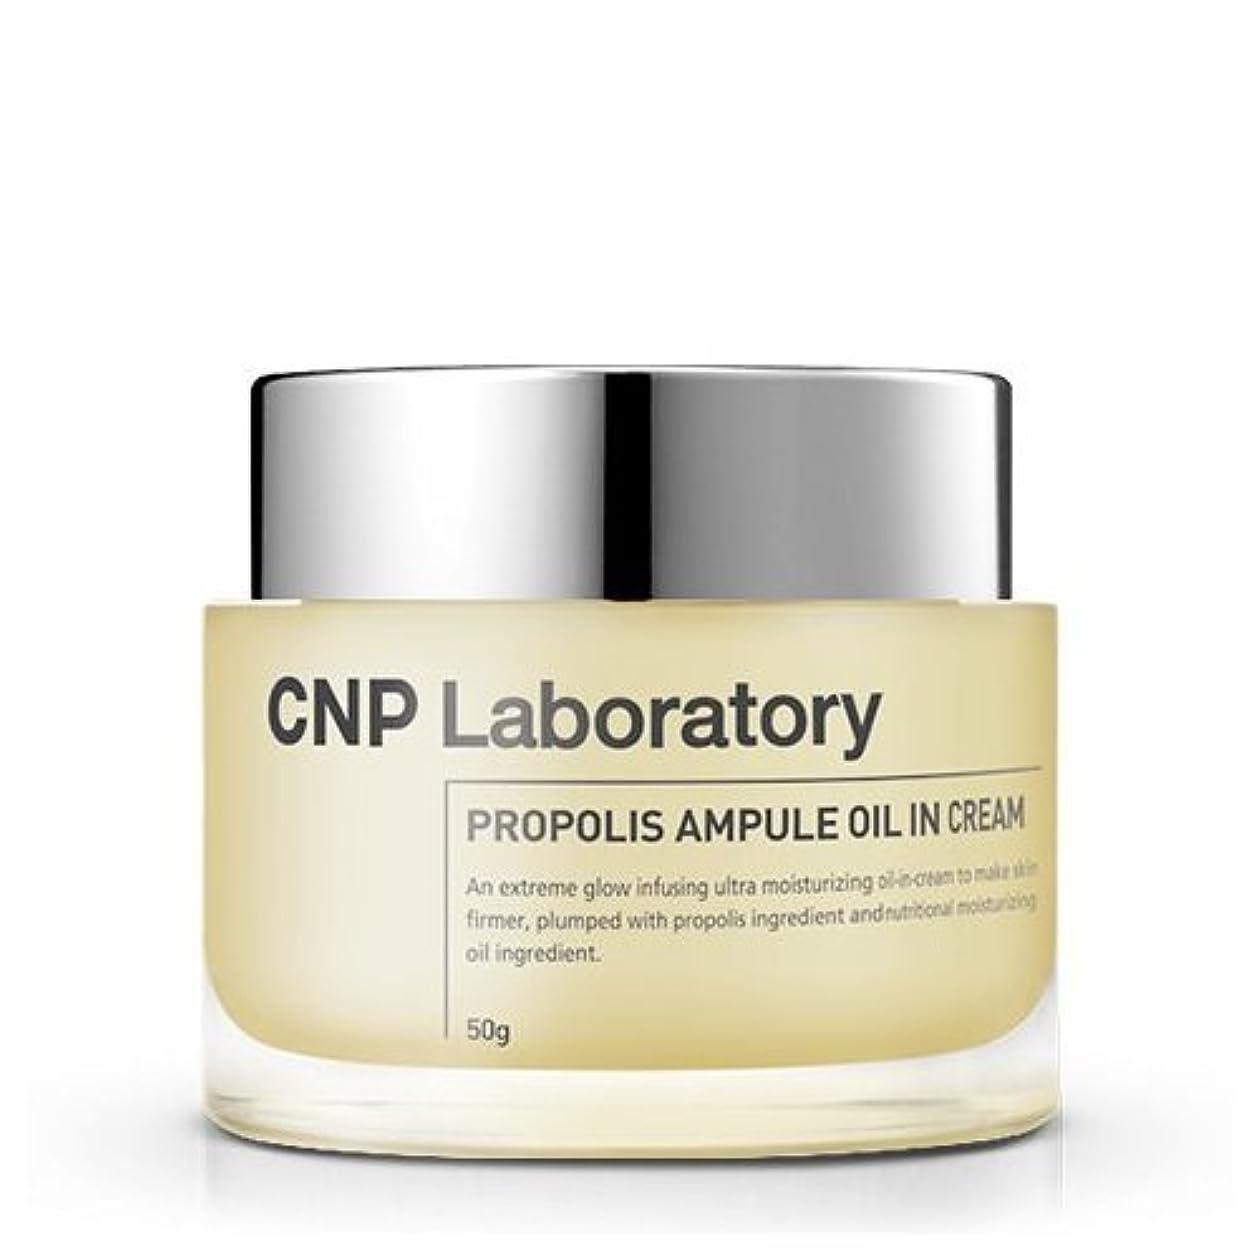 CNP Laboratory プロポリスアンプルオイルインクリーム50ミリリットル